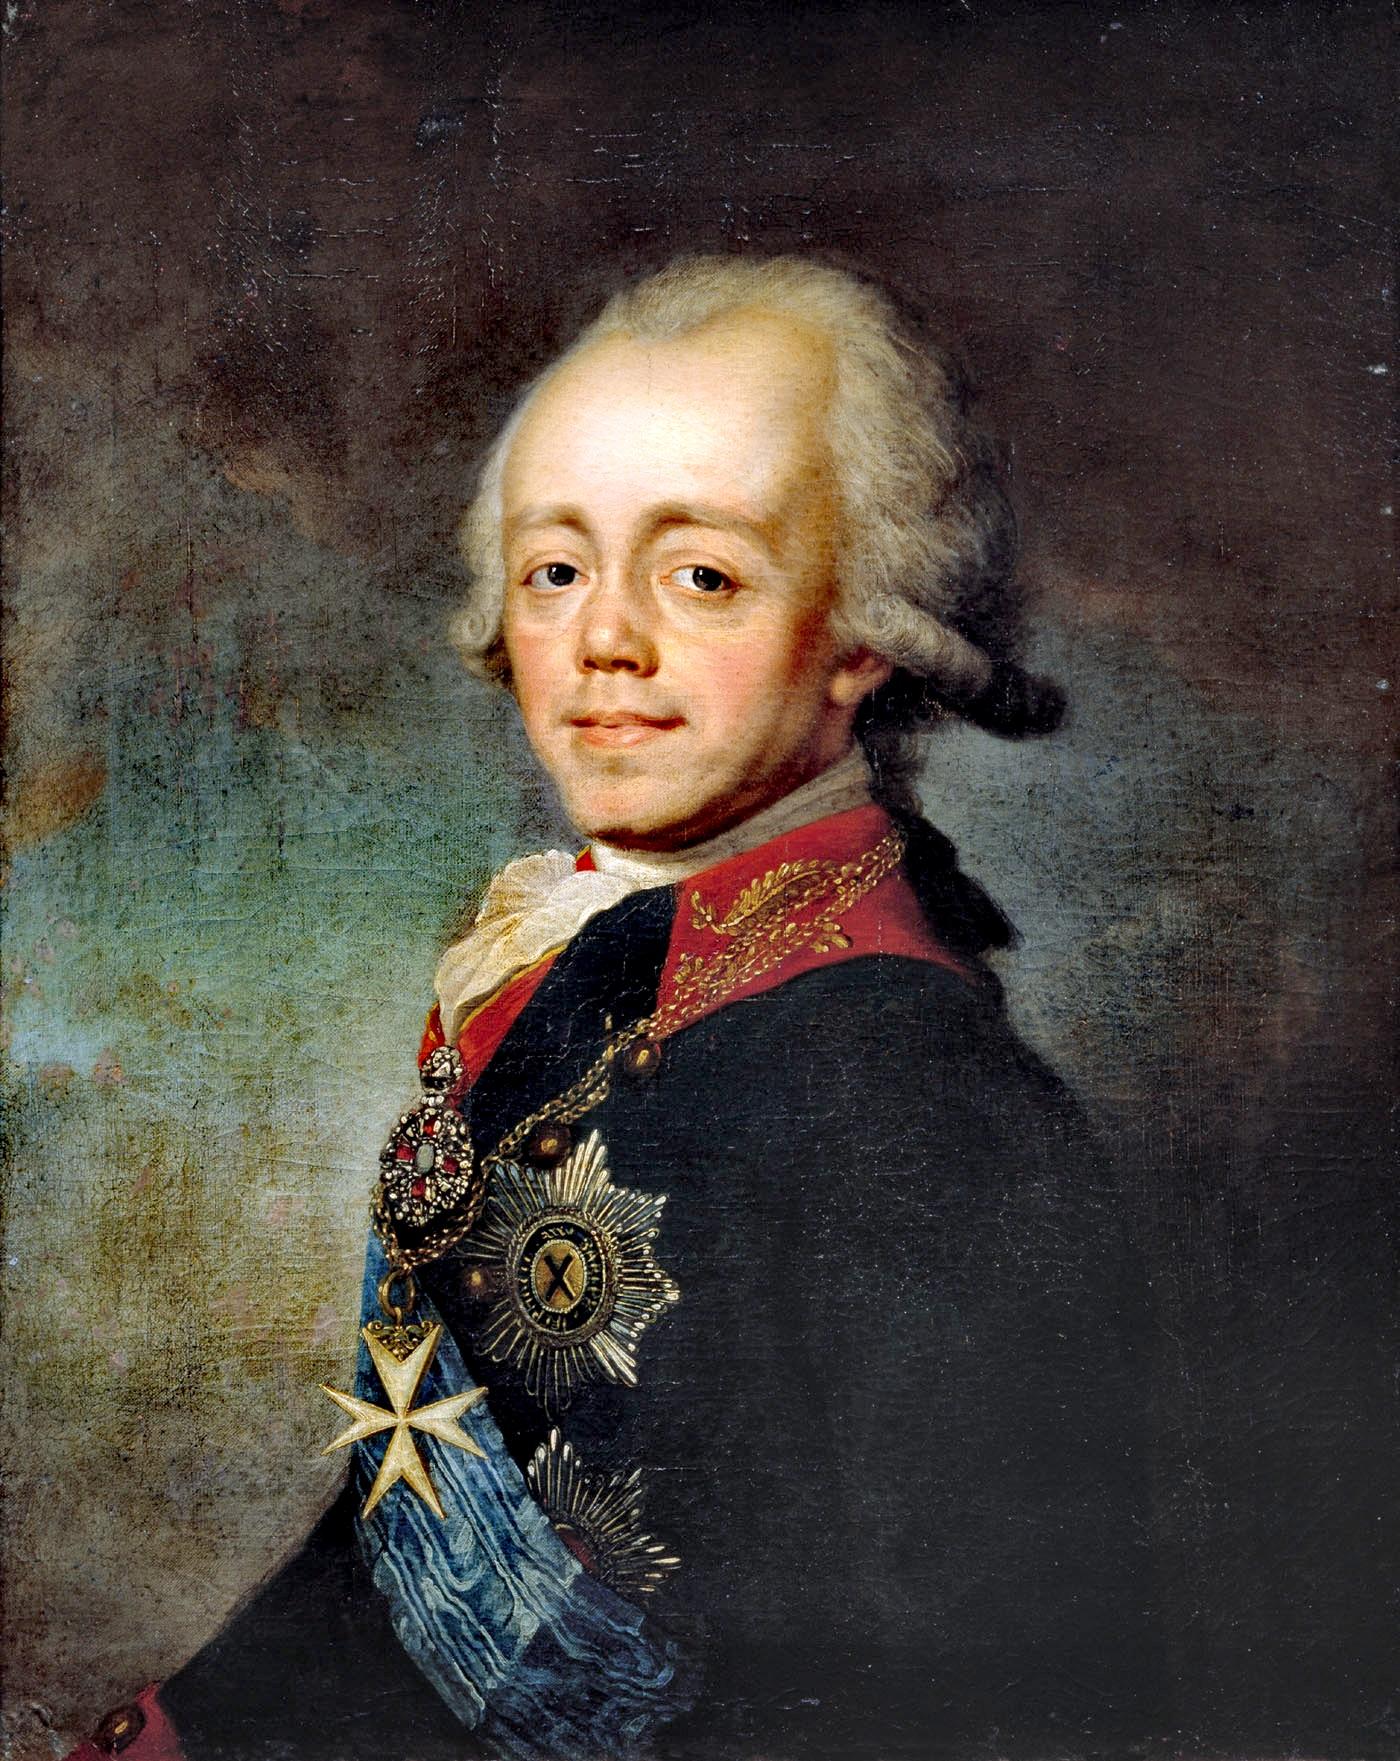 http://upload.wikimedia.org/wikipedia/commons/4/40/Paul_i_russia.jpg